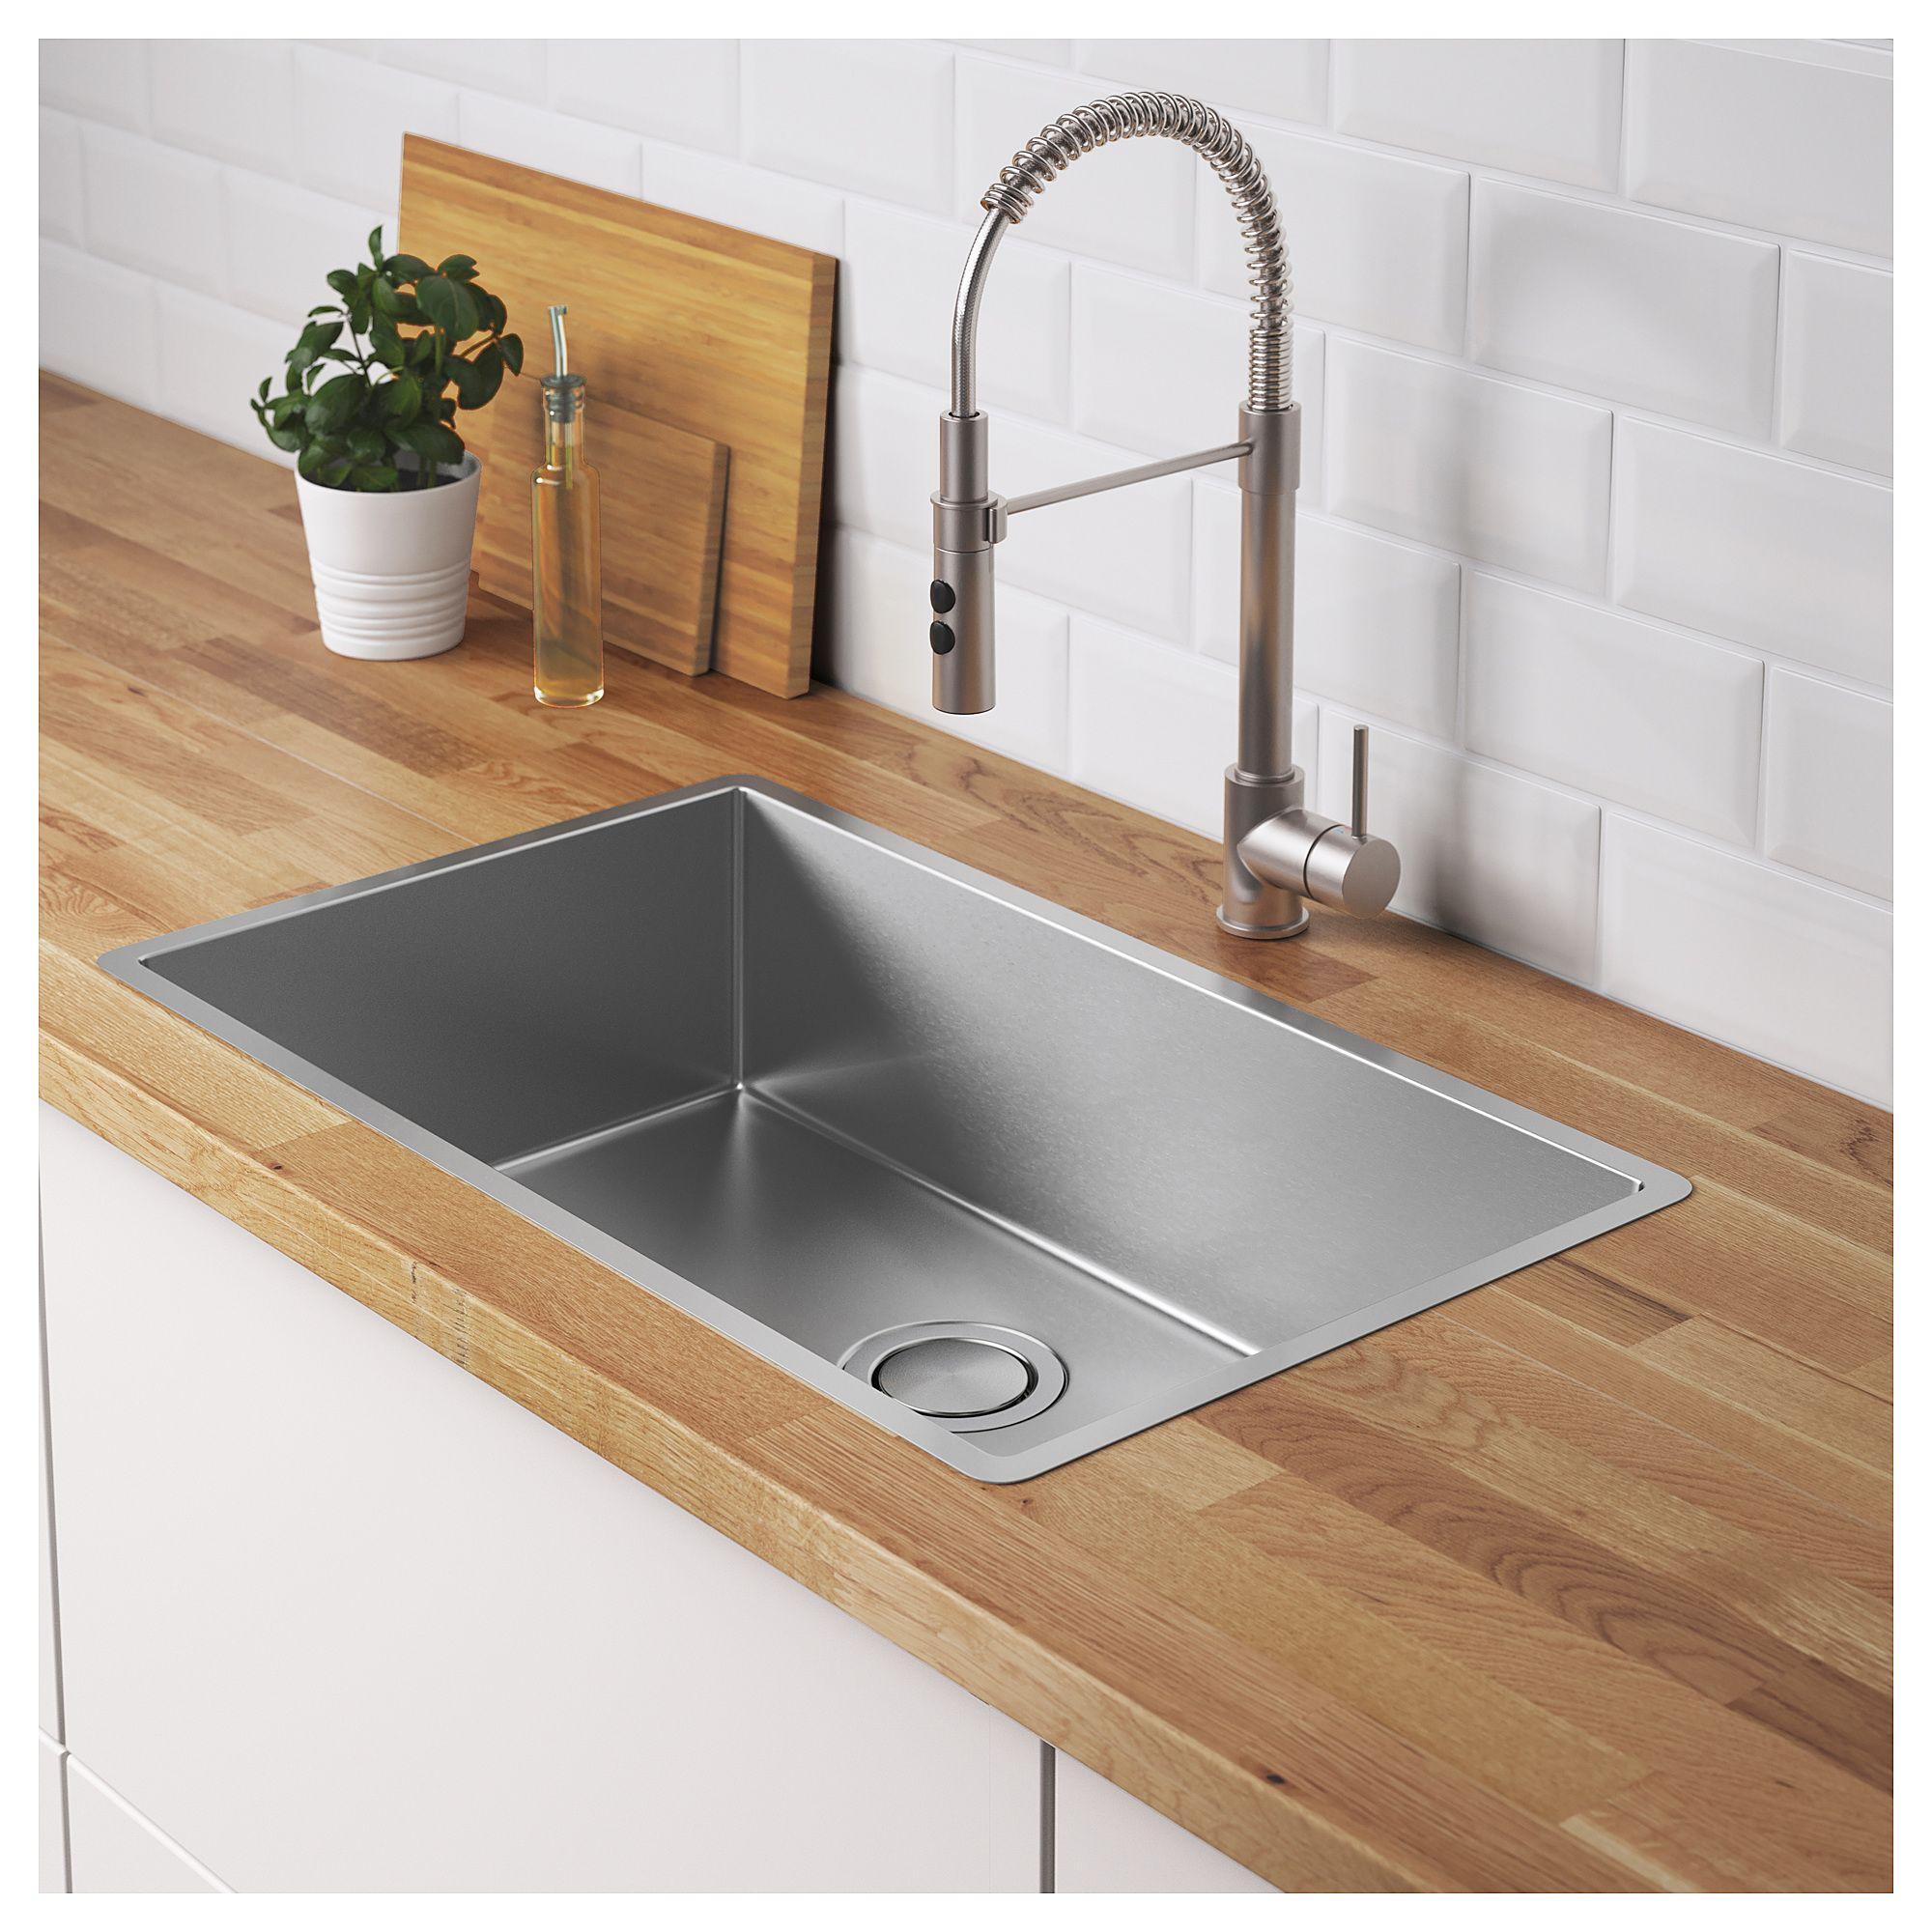 Norrsjon Sink Stainless Steel Sink Inset Sink Ikea Kitchen Sink